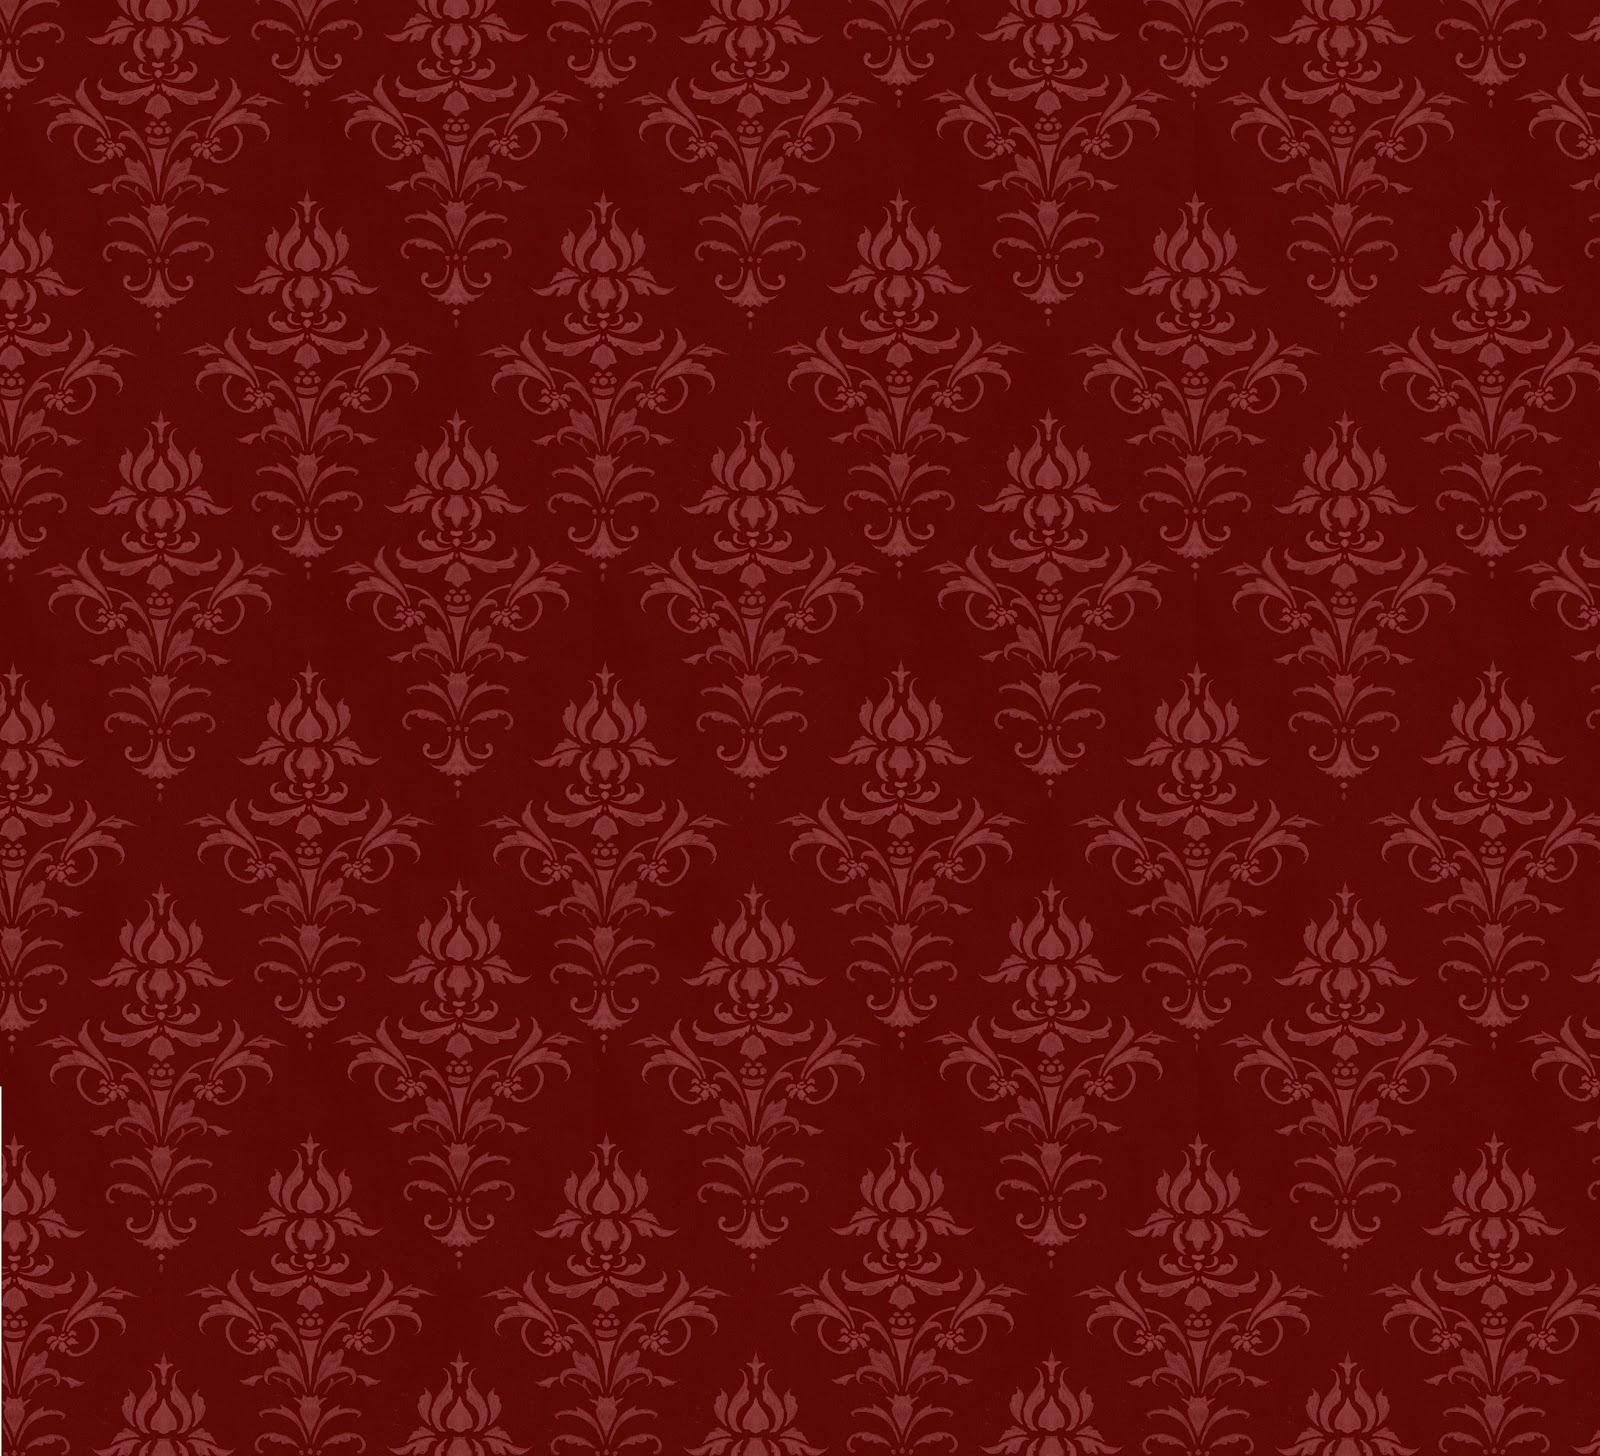 The Wallpaper Backgrounds Victorian Wallpaper 1600x1456